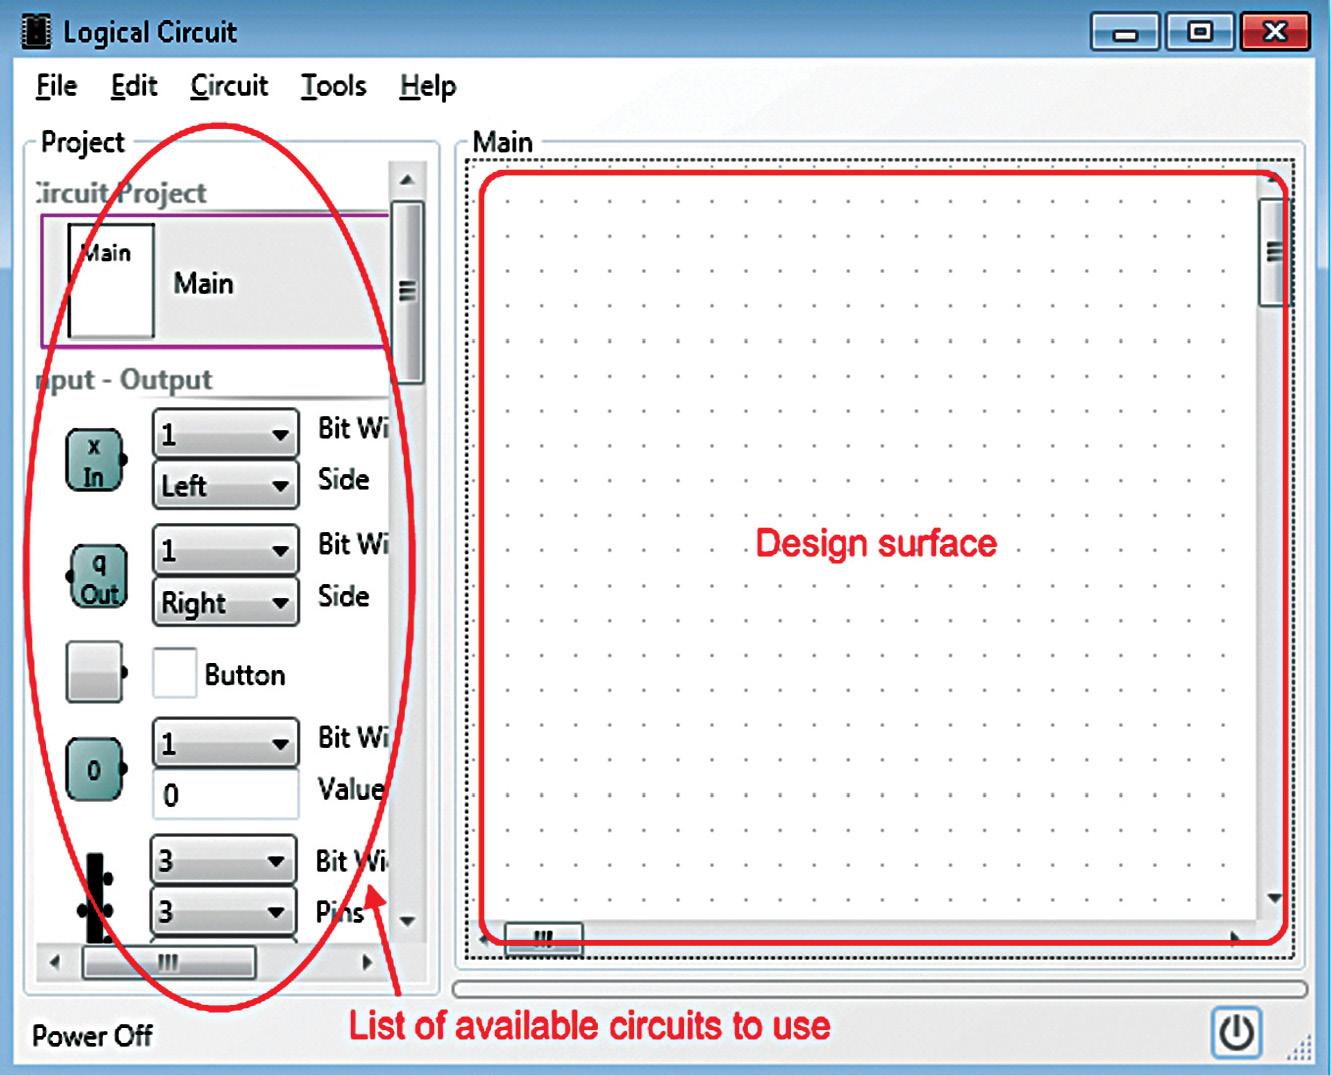 Logiccircuit Building Digital Circuits Made Easy Software Review Logic Tutorial